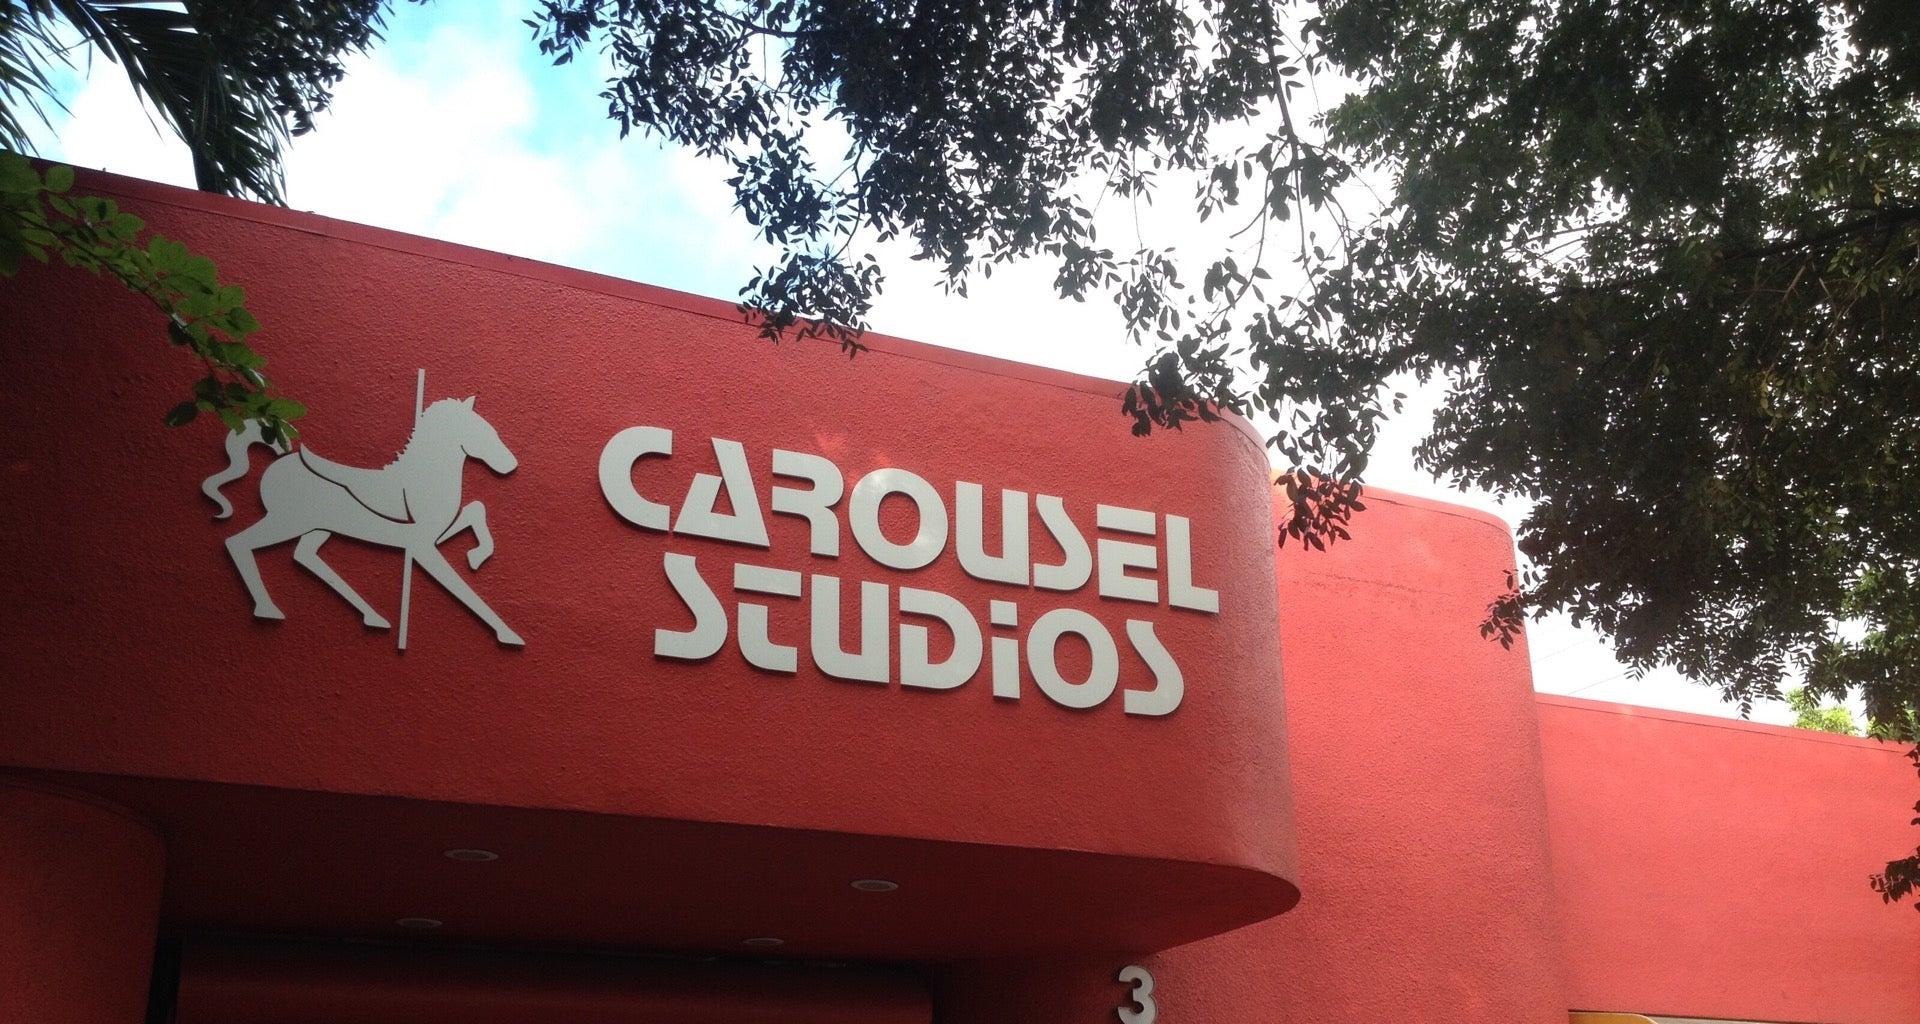 CAROUSEL STUDIO,